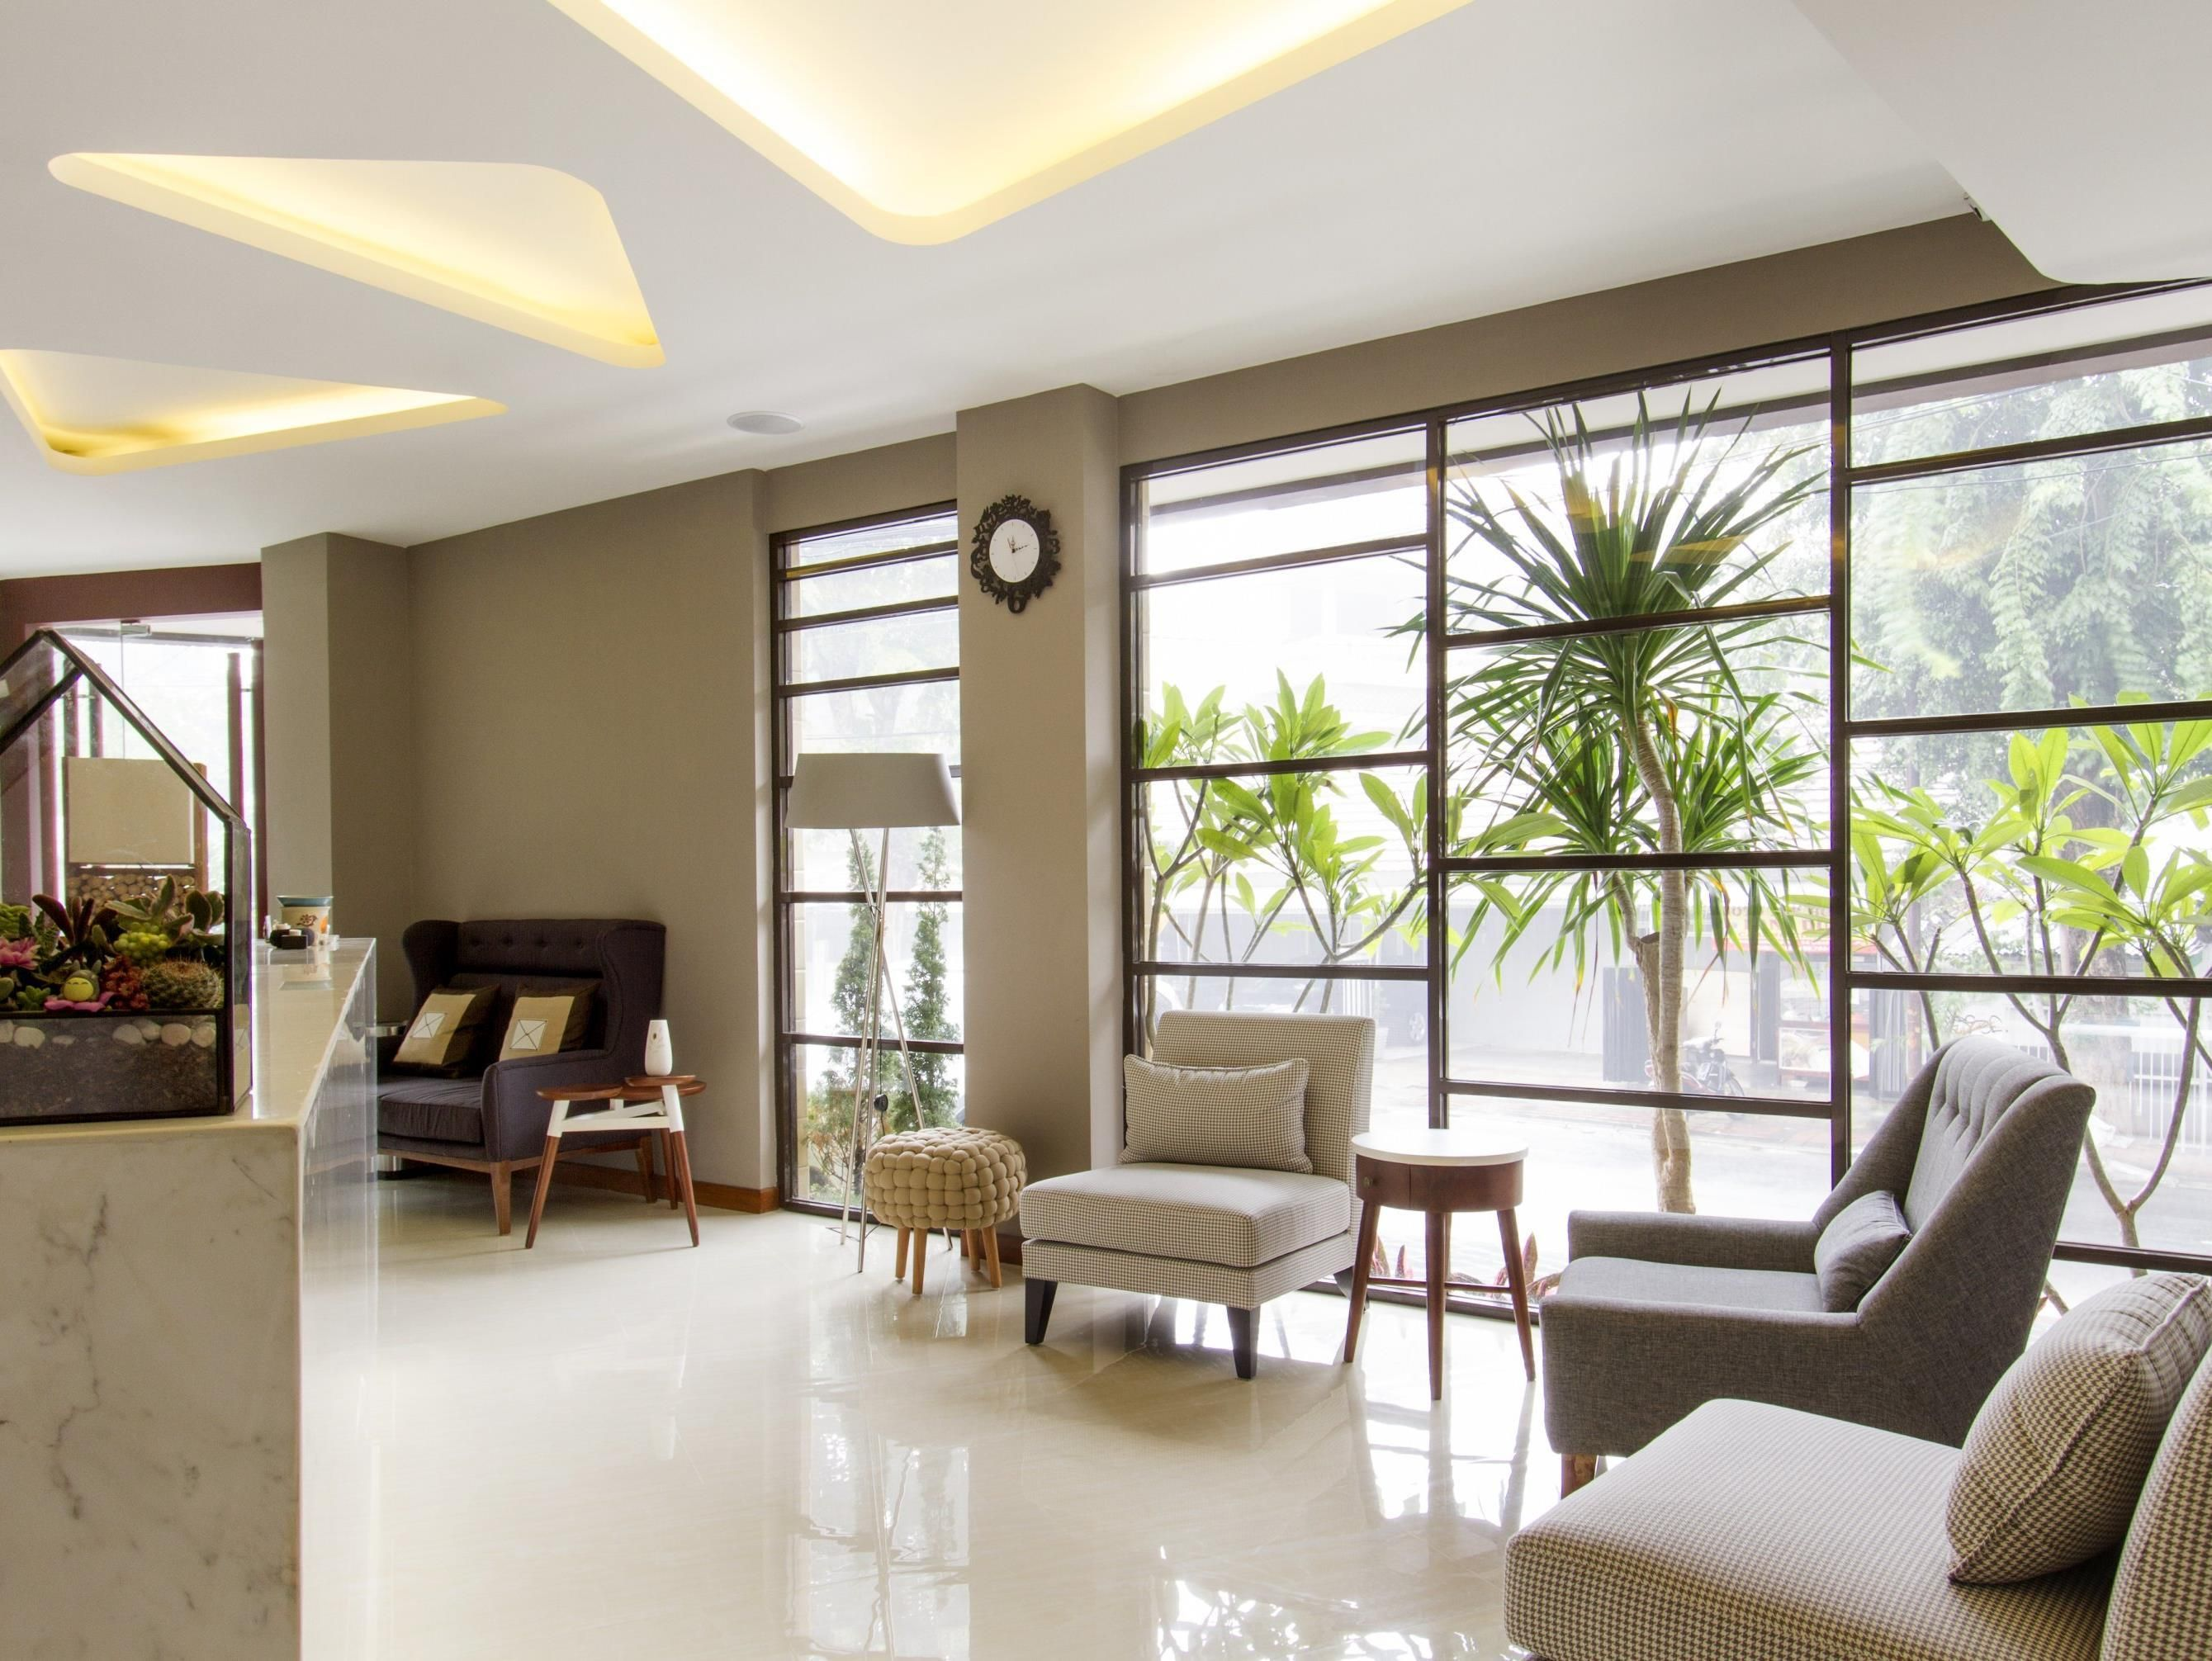 Jakarta Sawana Suites Indonesia, Asia Sawana Suites is